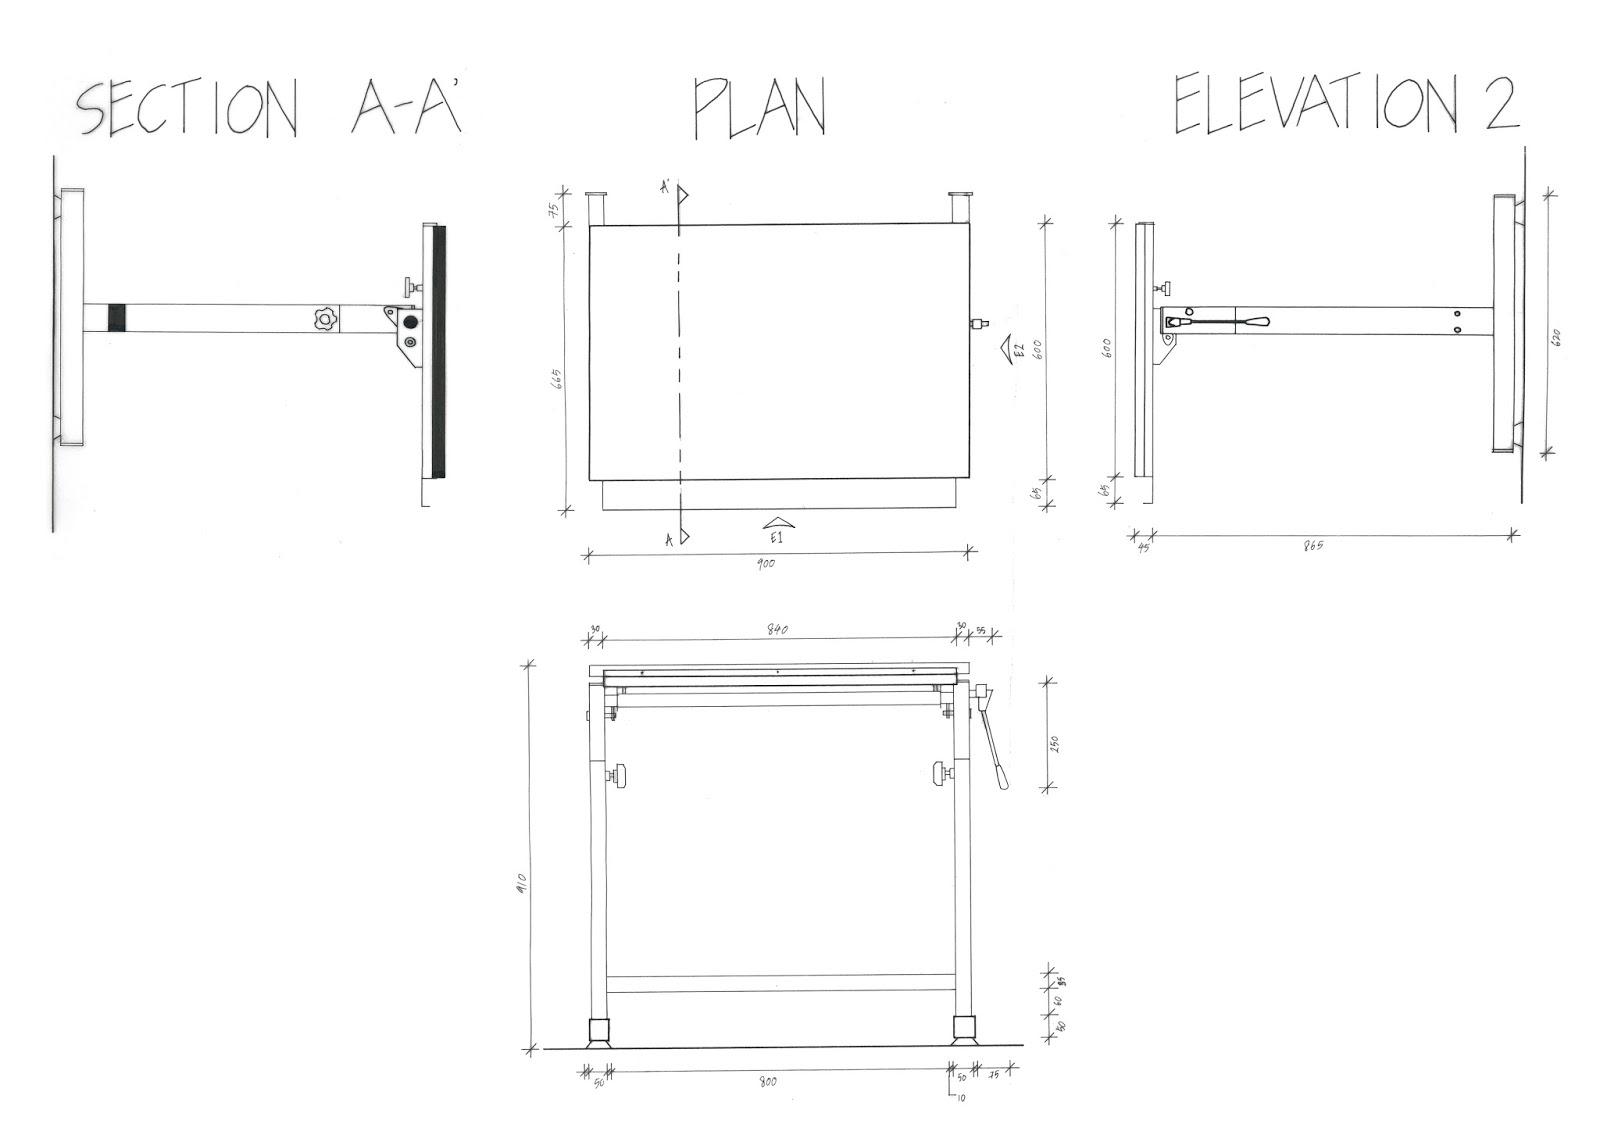 Rui Ying S E Portfolio Dcomm Project 2a Orthographic